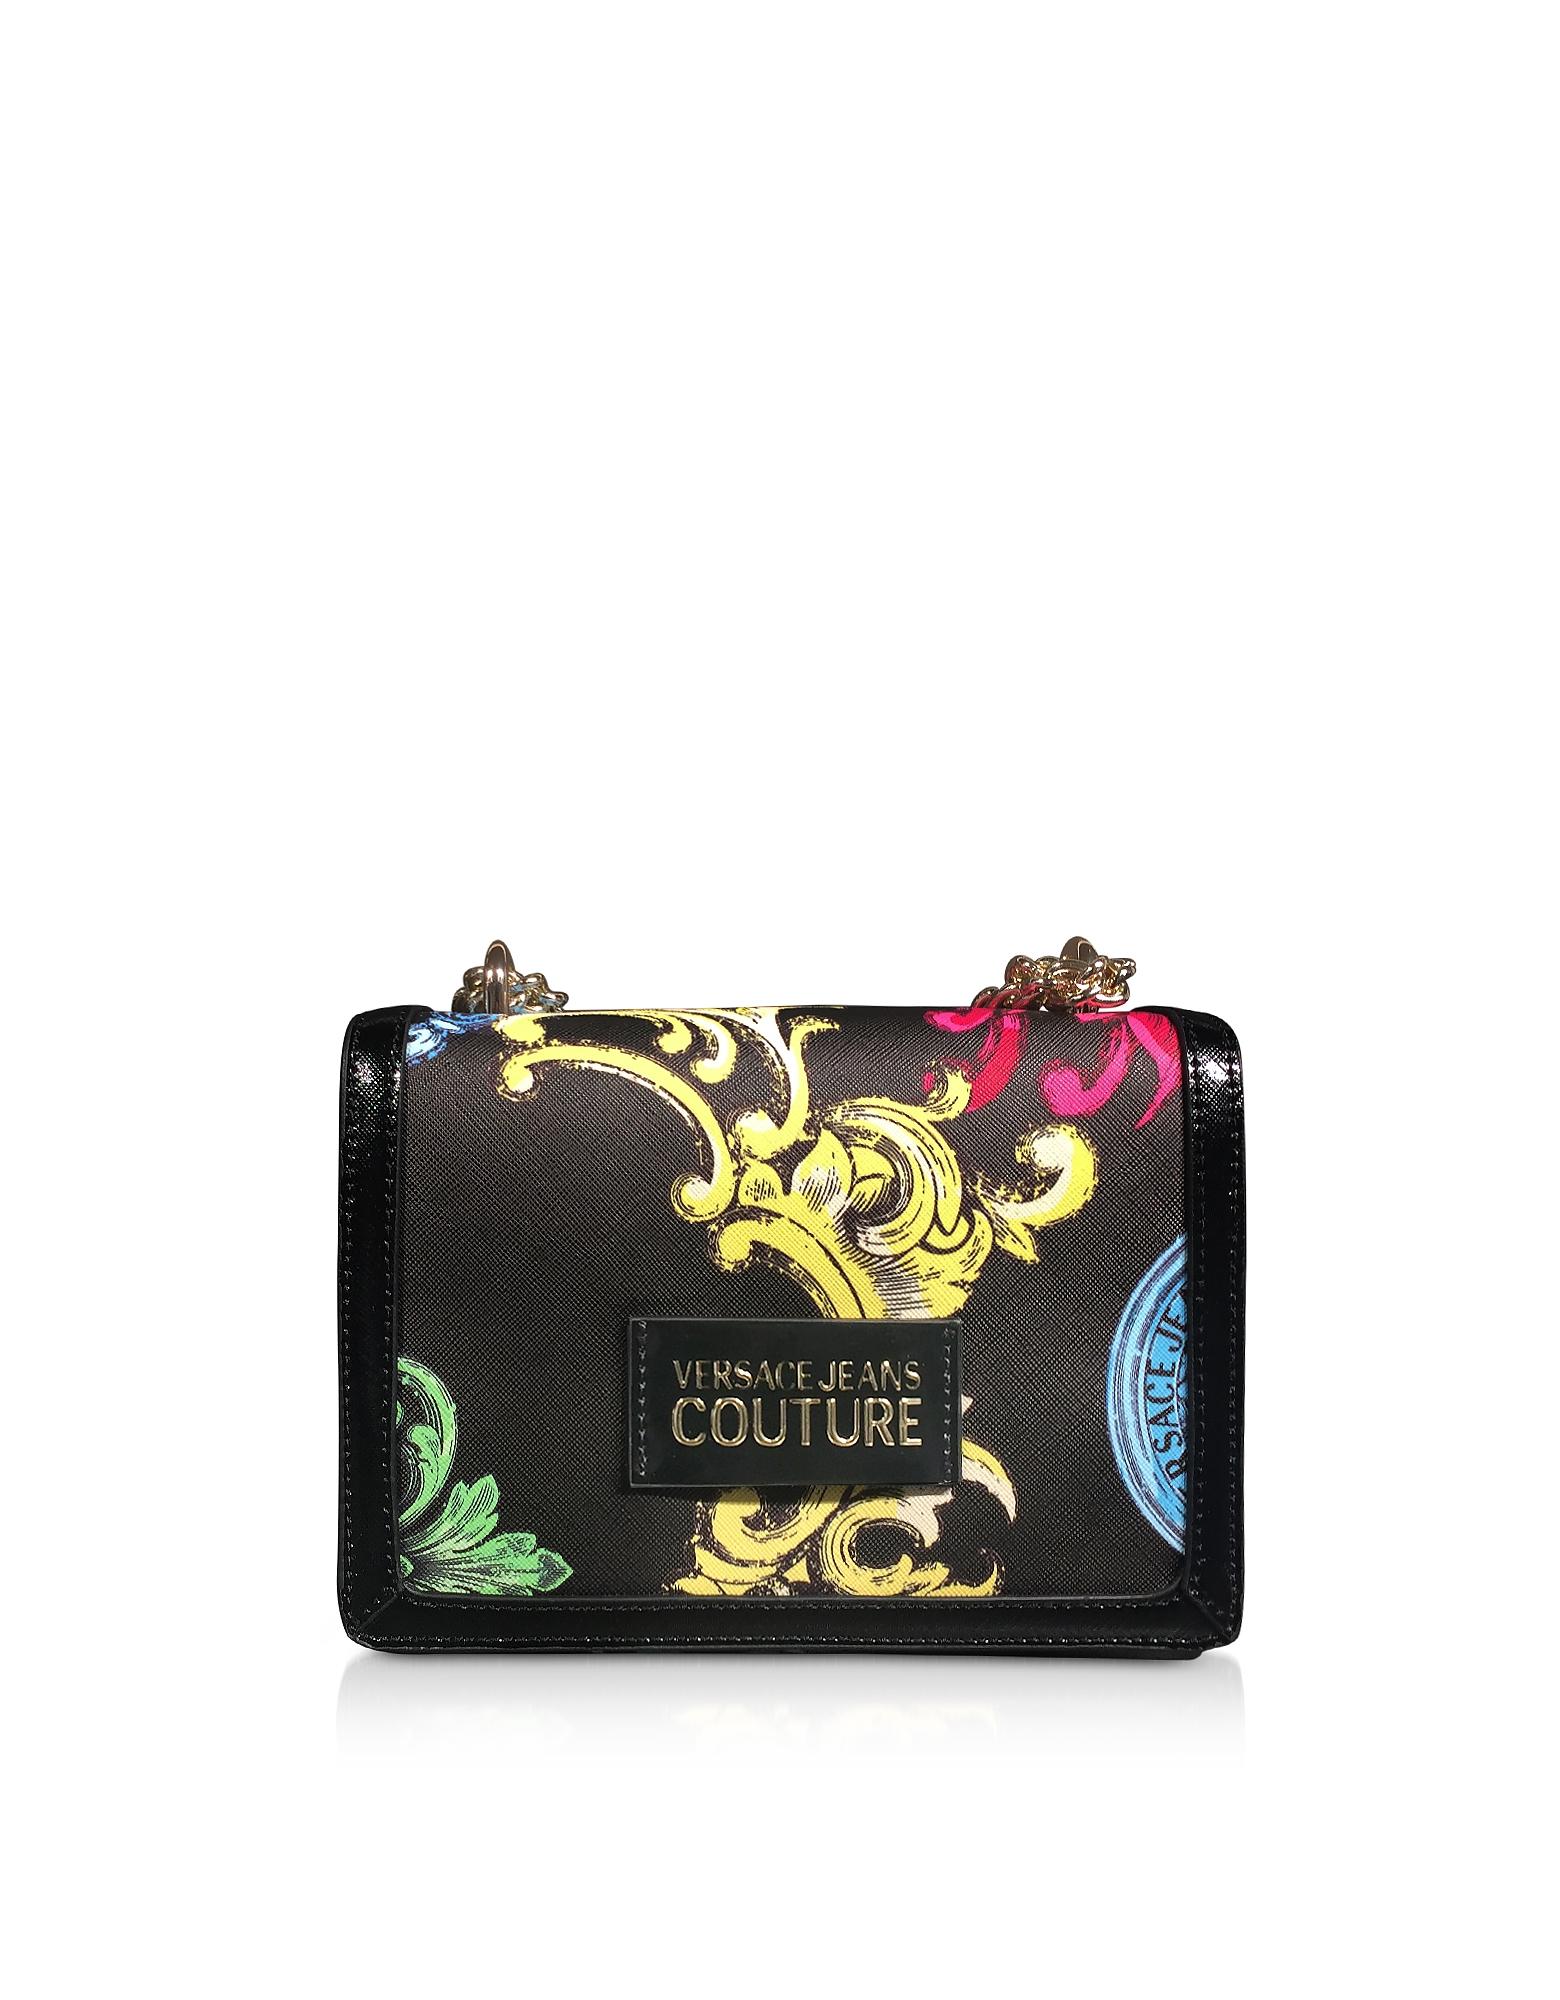 Versace Jeans Couture Designer Handbags, Small Black Saffiano Heritage Shoulder Bag